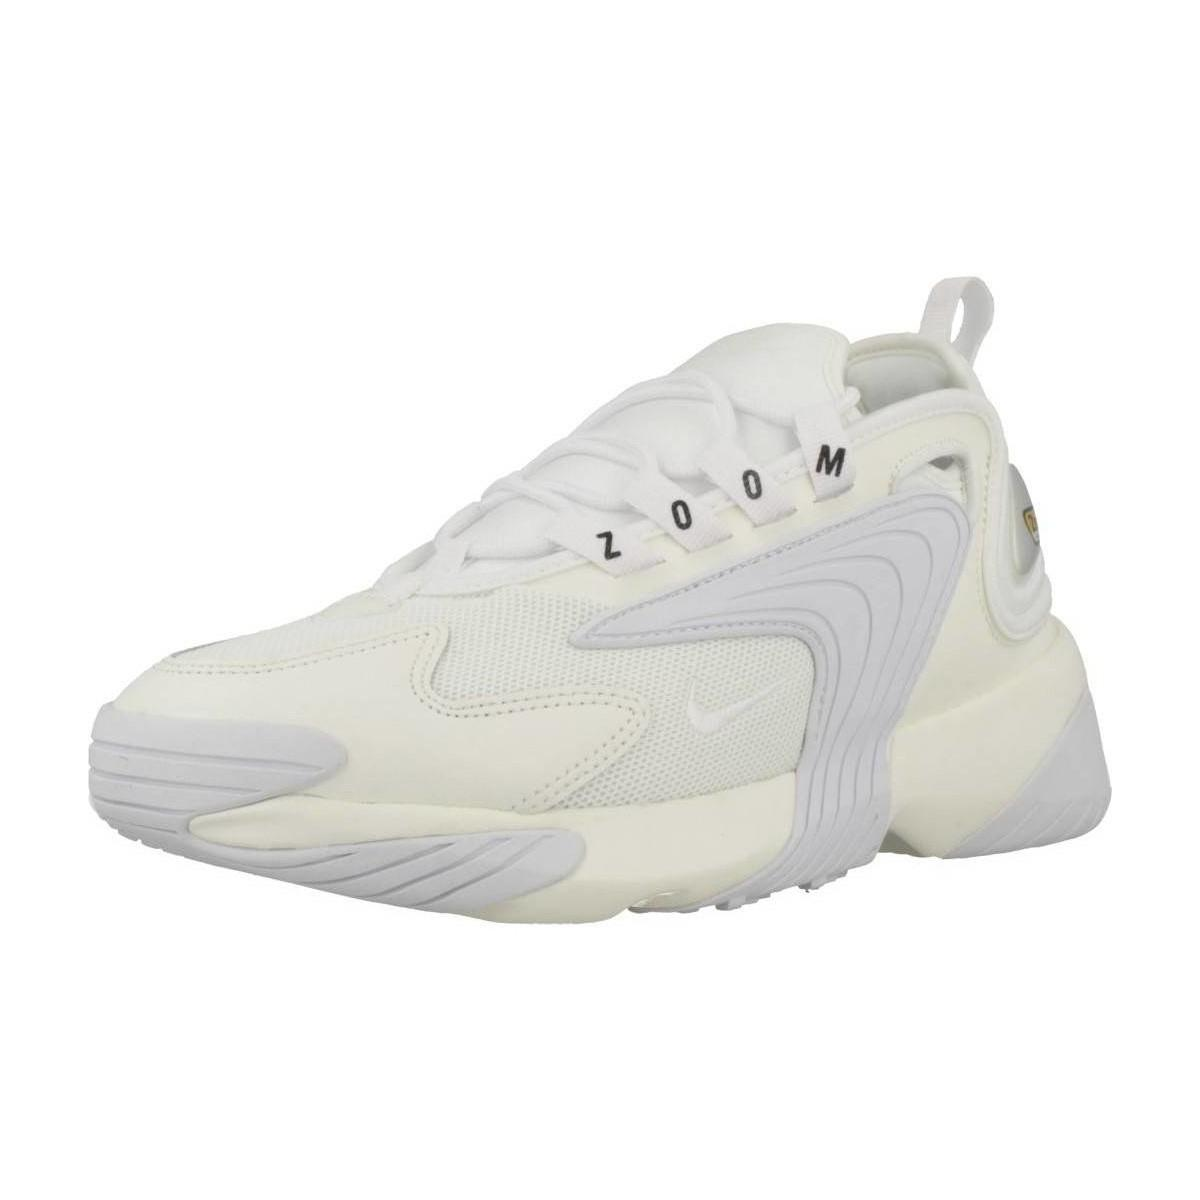 Espantar Claraboya Nos vemos mañana  Nike Zoom 2k Women's Shoes (trainers) In White in White - Lyst